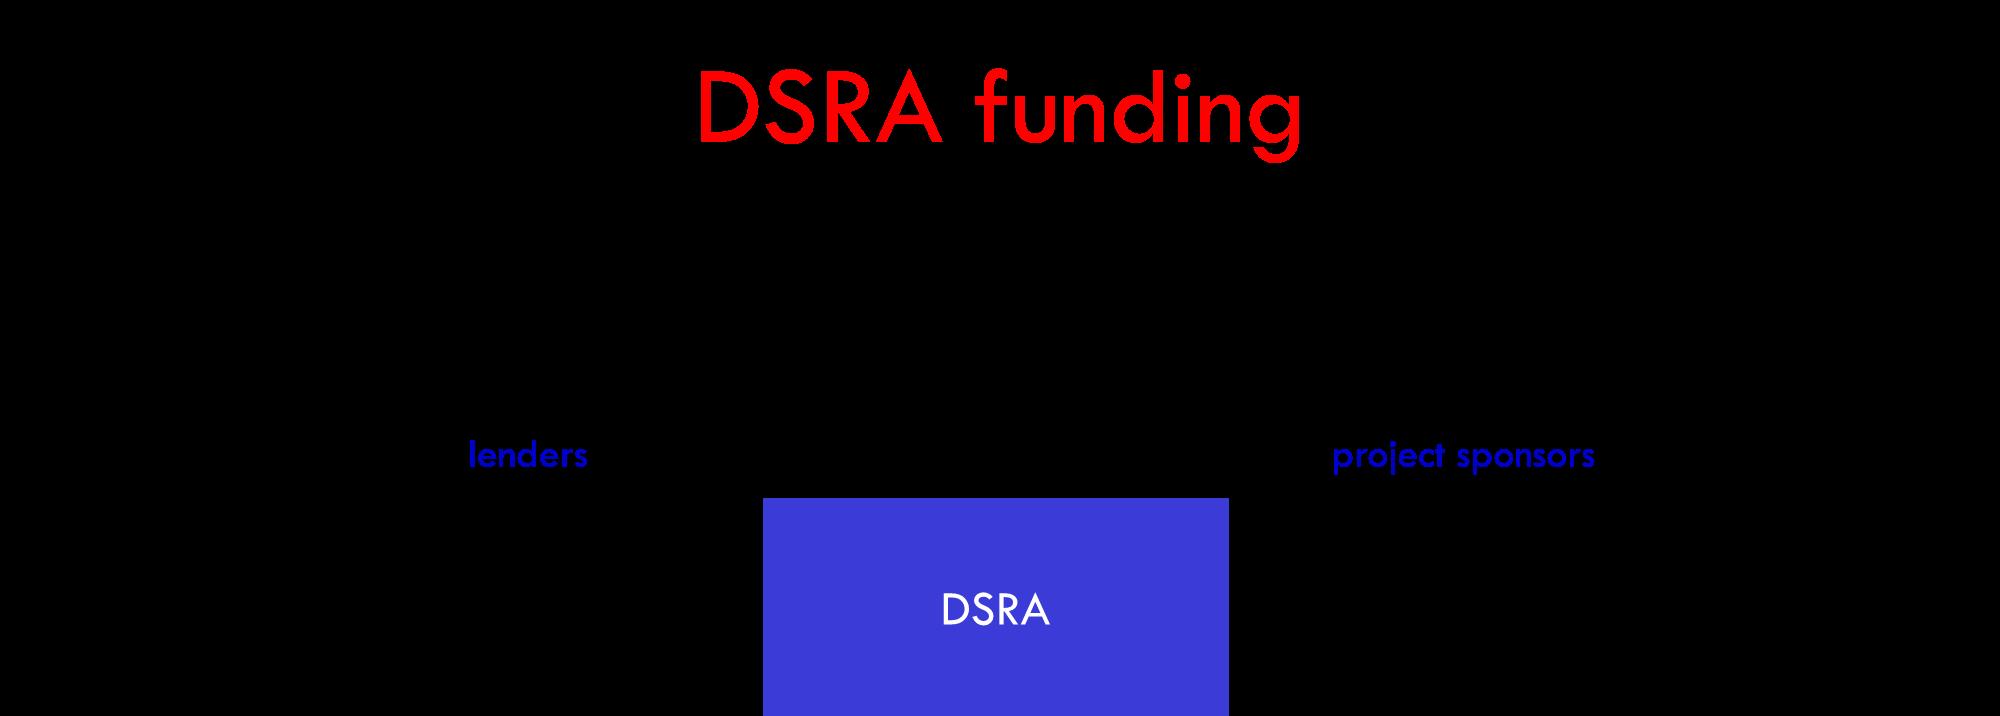 DSRA funding